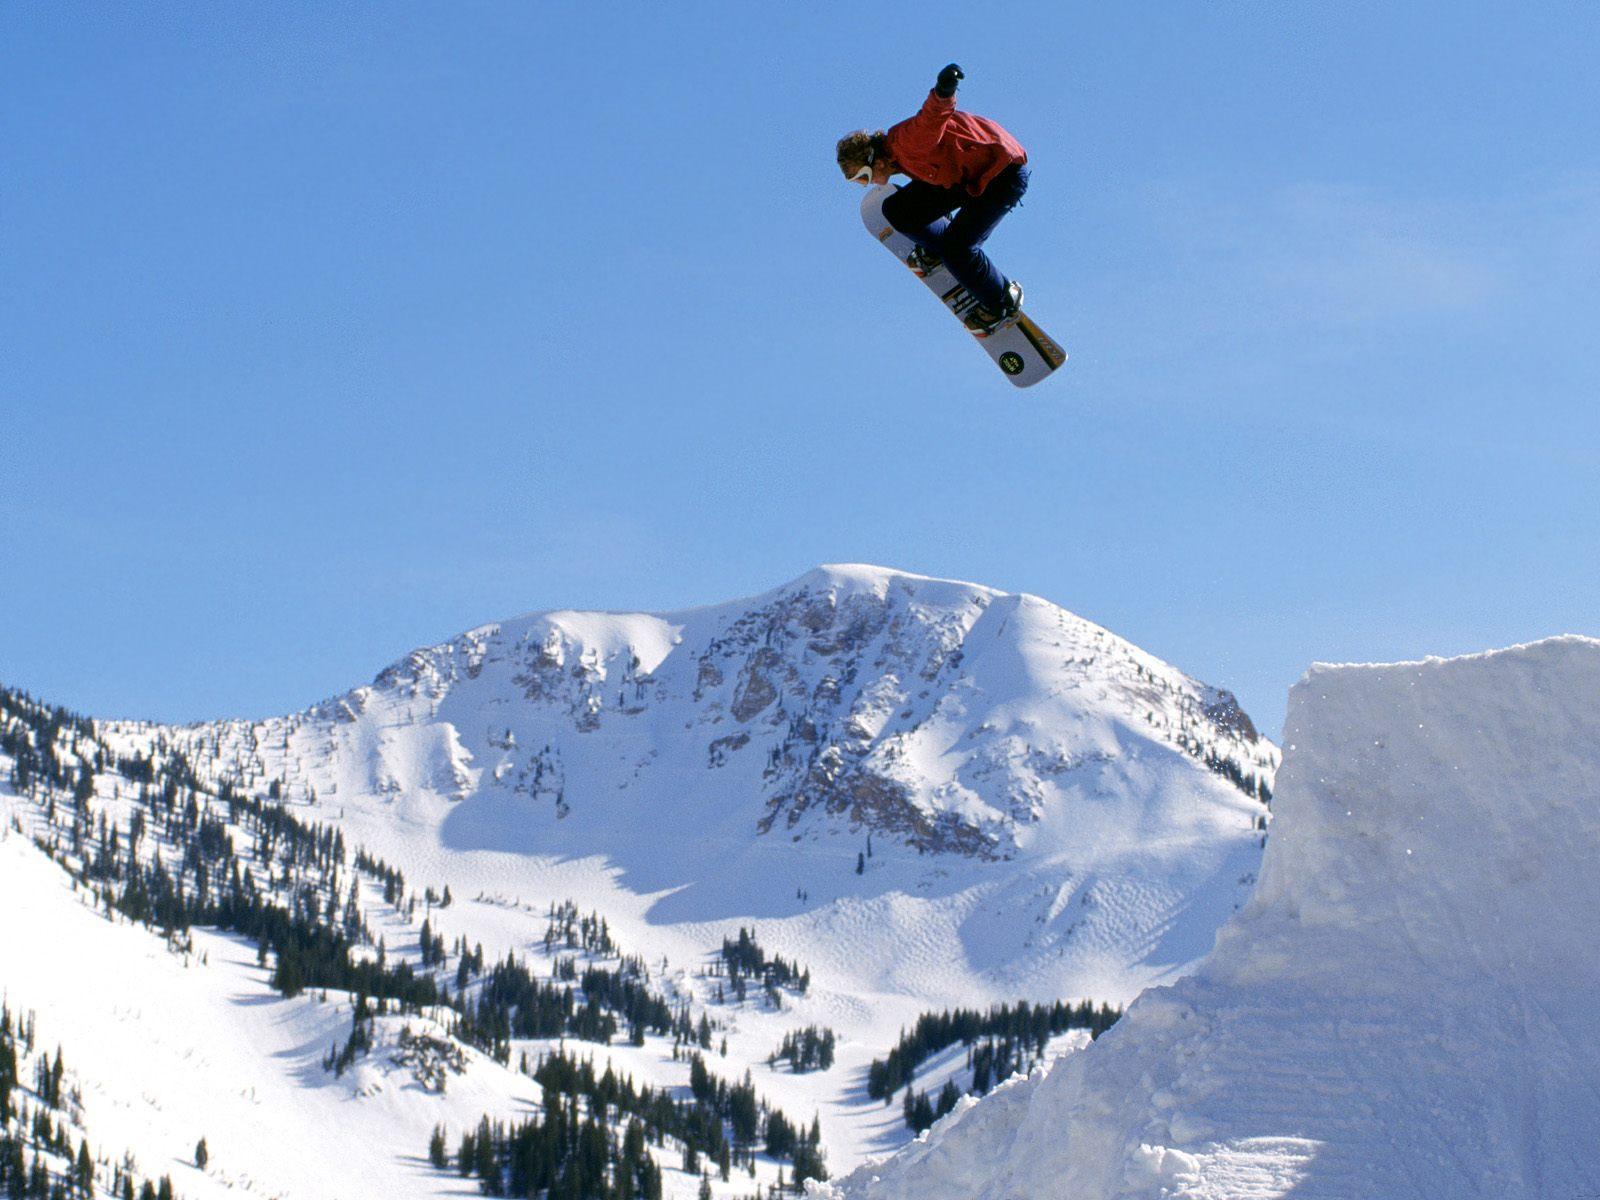 Tiffany Best Snowboarding Wallpaper Hd